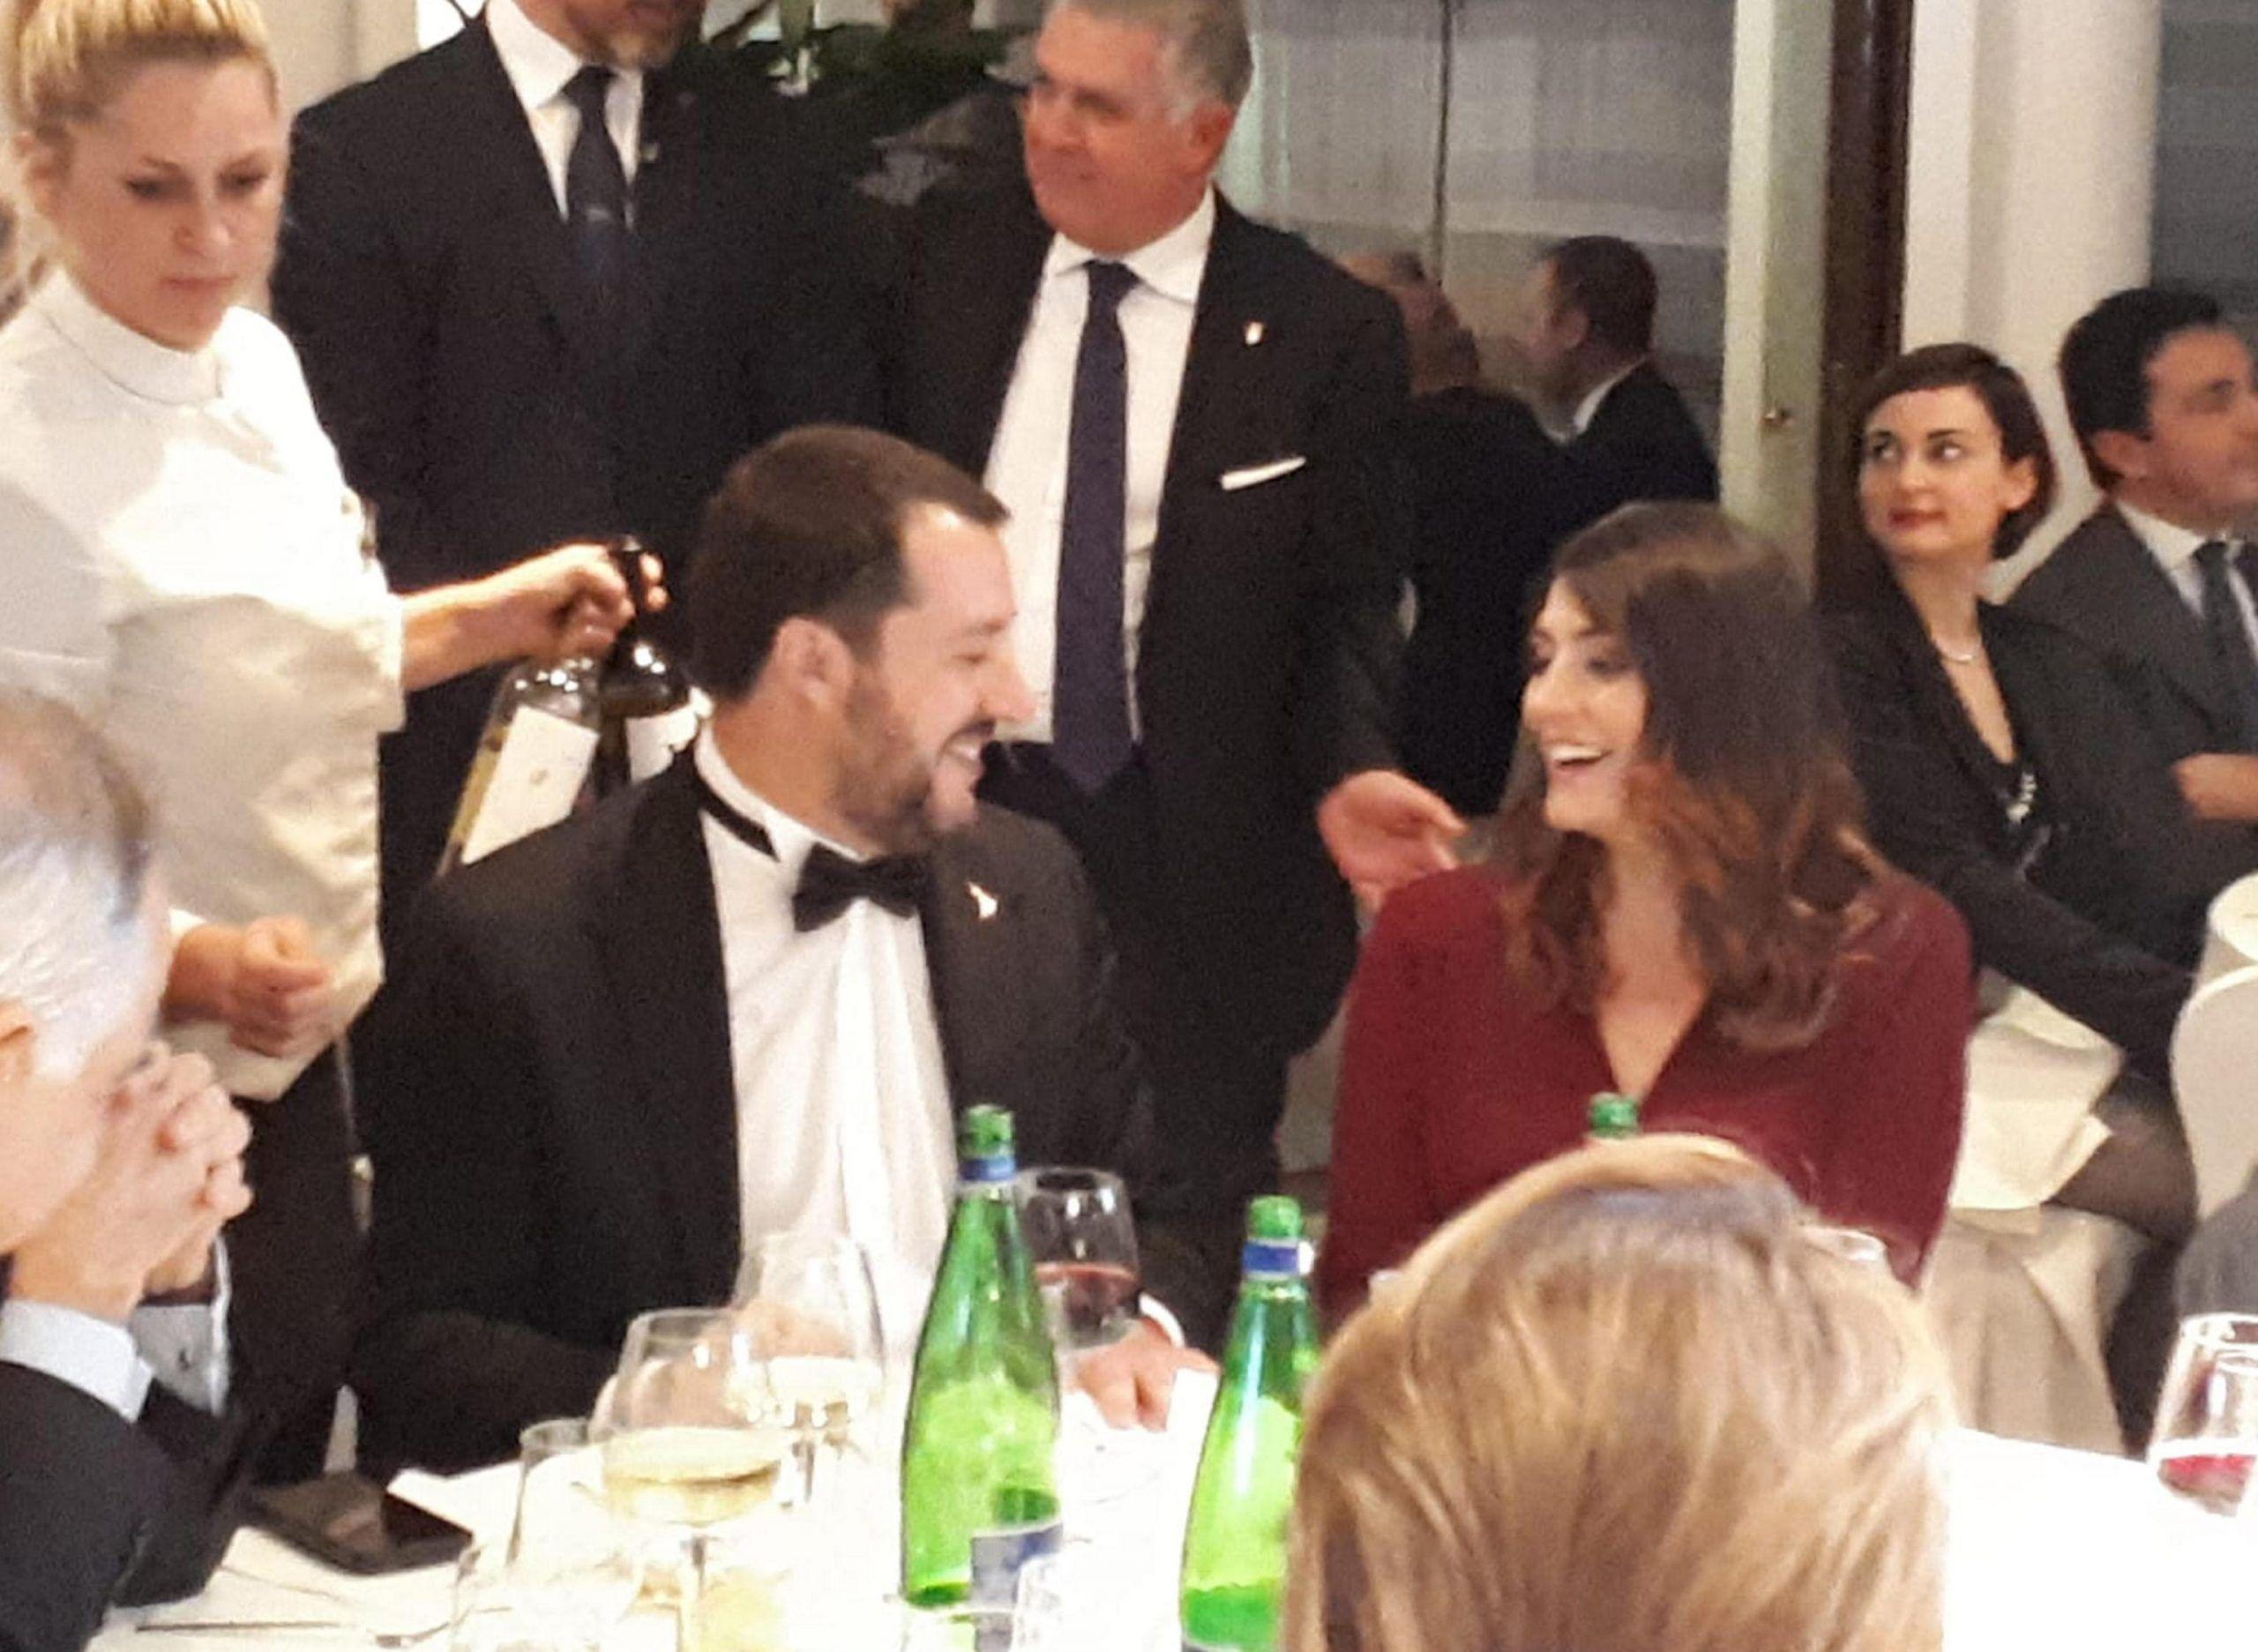 Elisa Isoardi e Matteo Salvini di nuovo insieme per una cena di gala